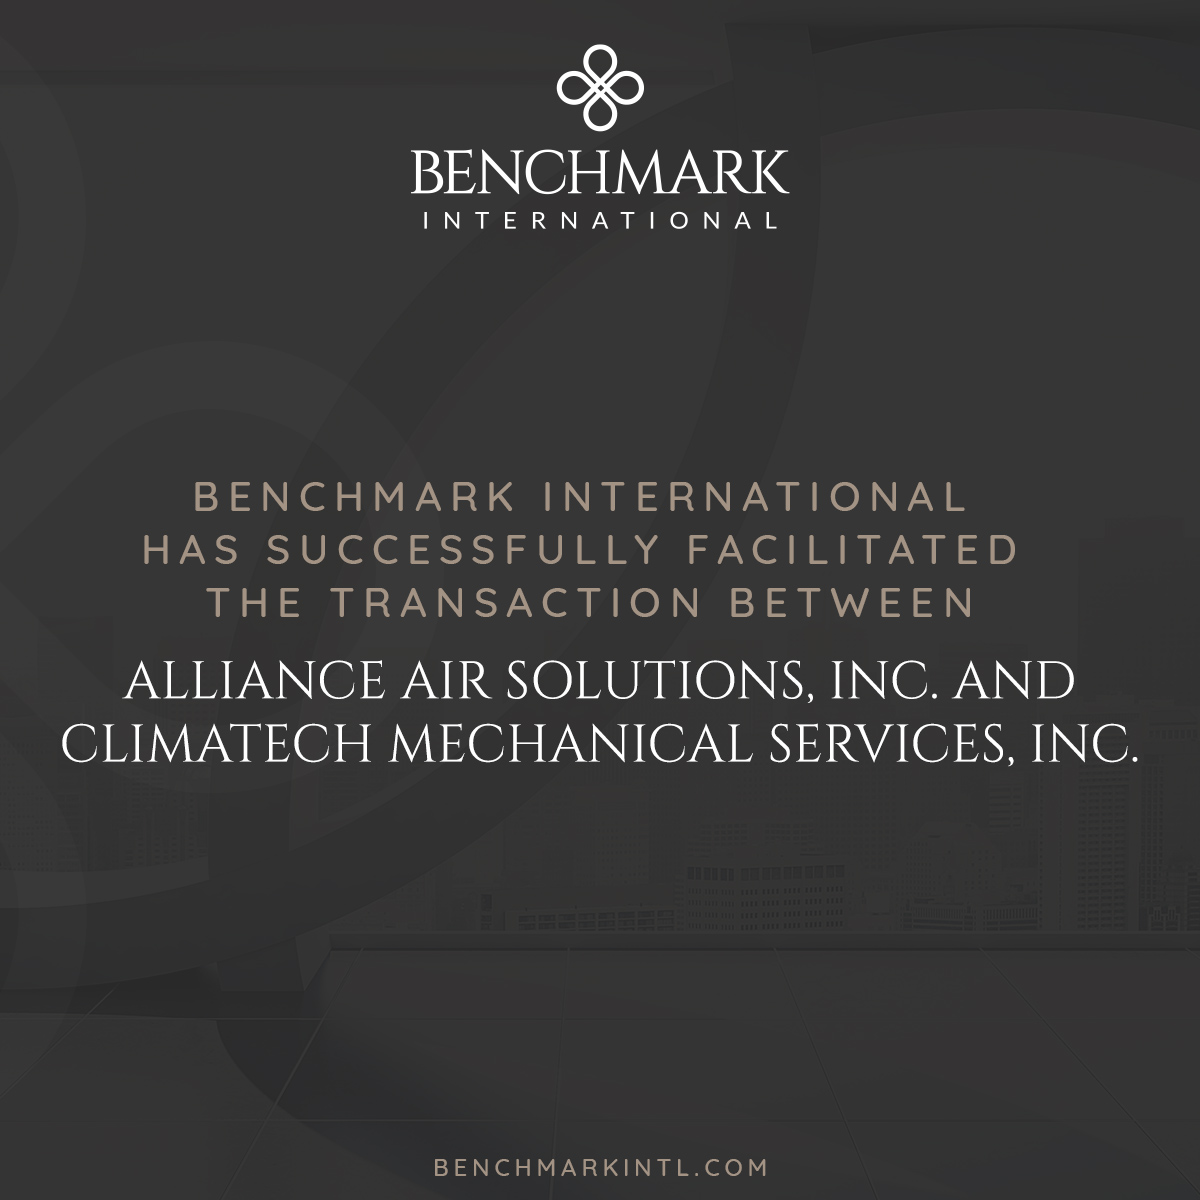 Alliance_Air_Solutions_&_Climatech_Mechanical_Services_Social